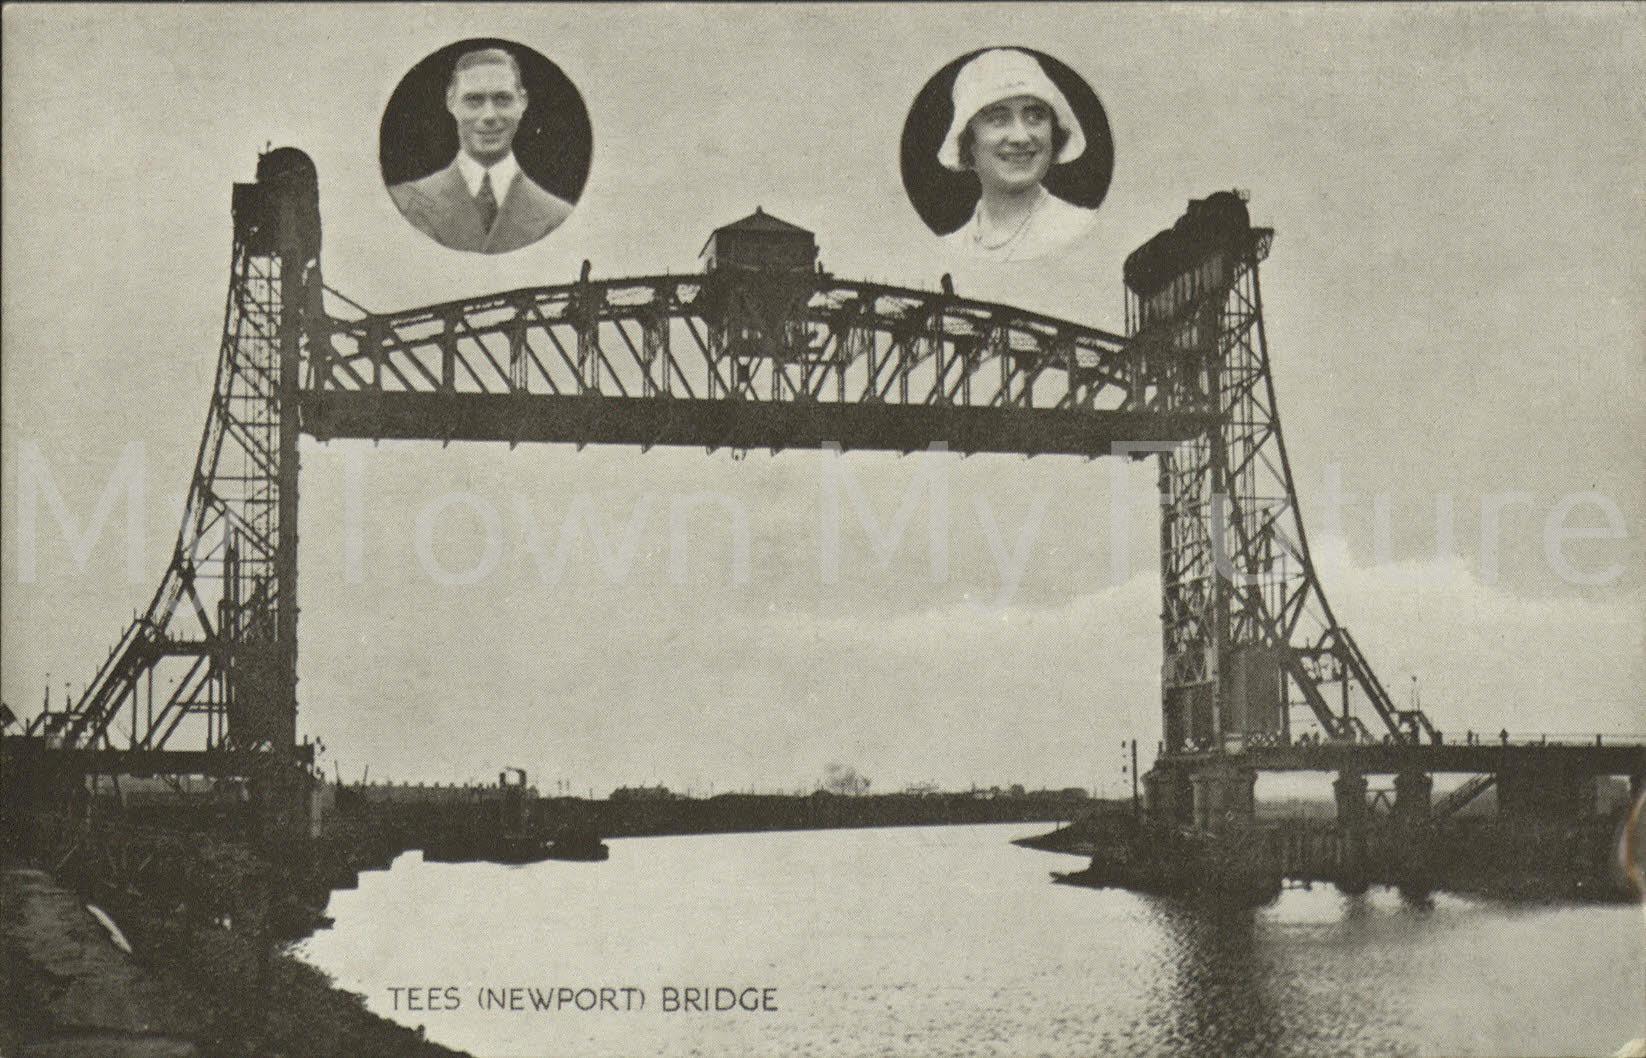 Newport Bridge - Royal Couple Prince George and Mary, Sanbridge - Middlesbrough